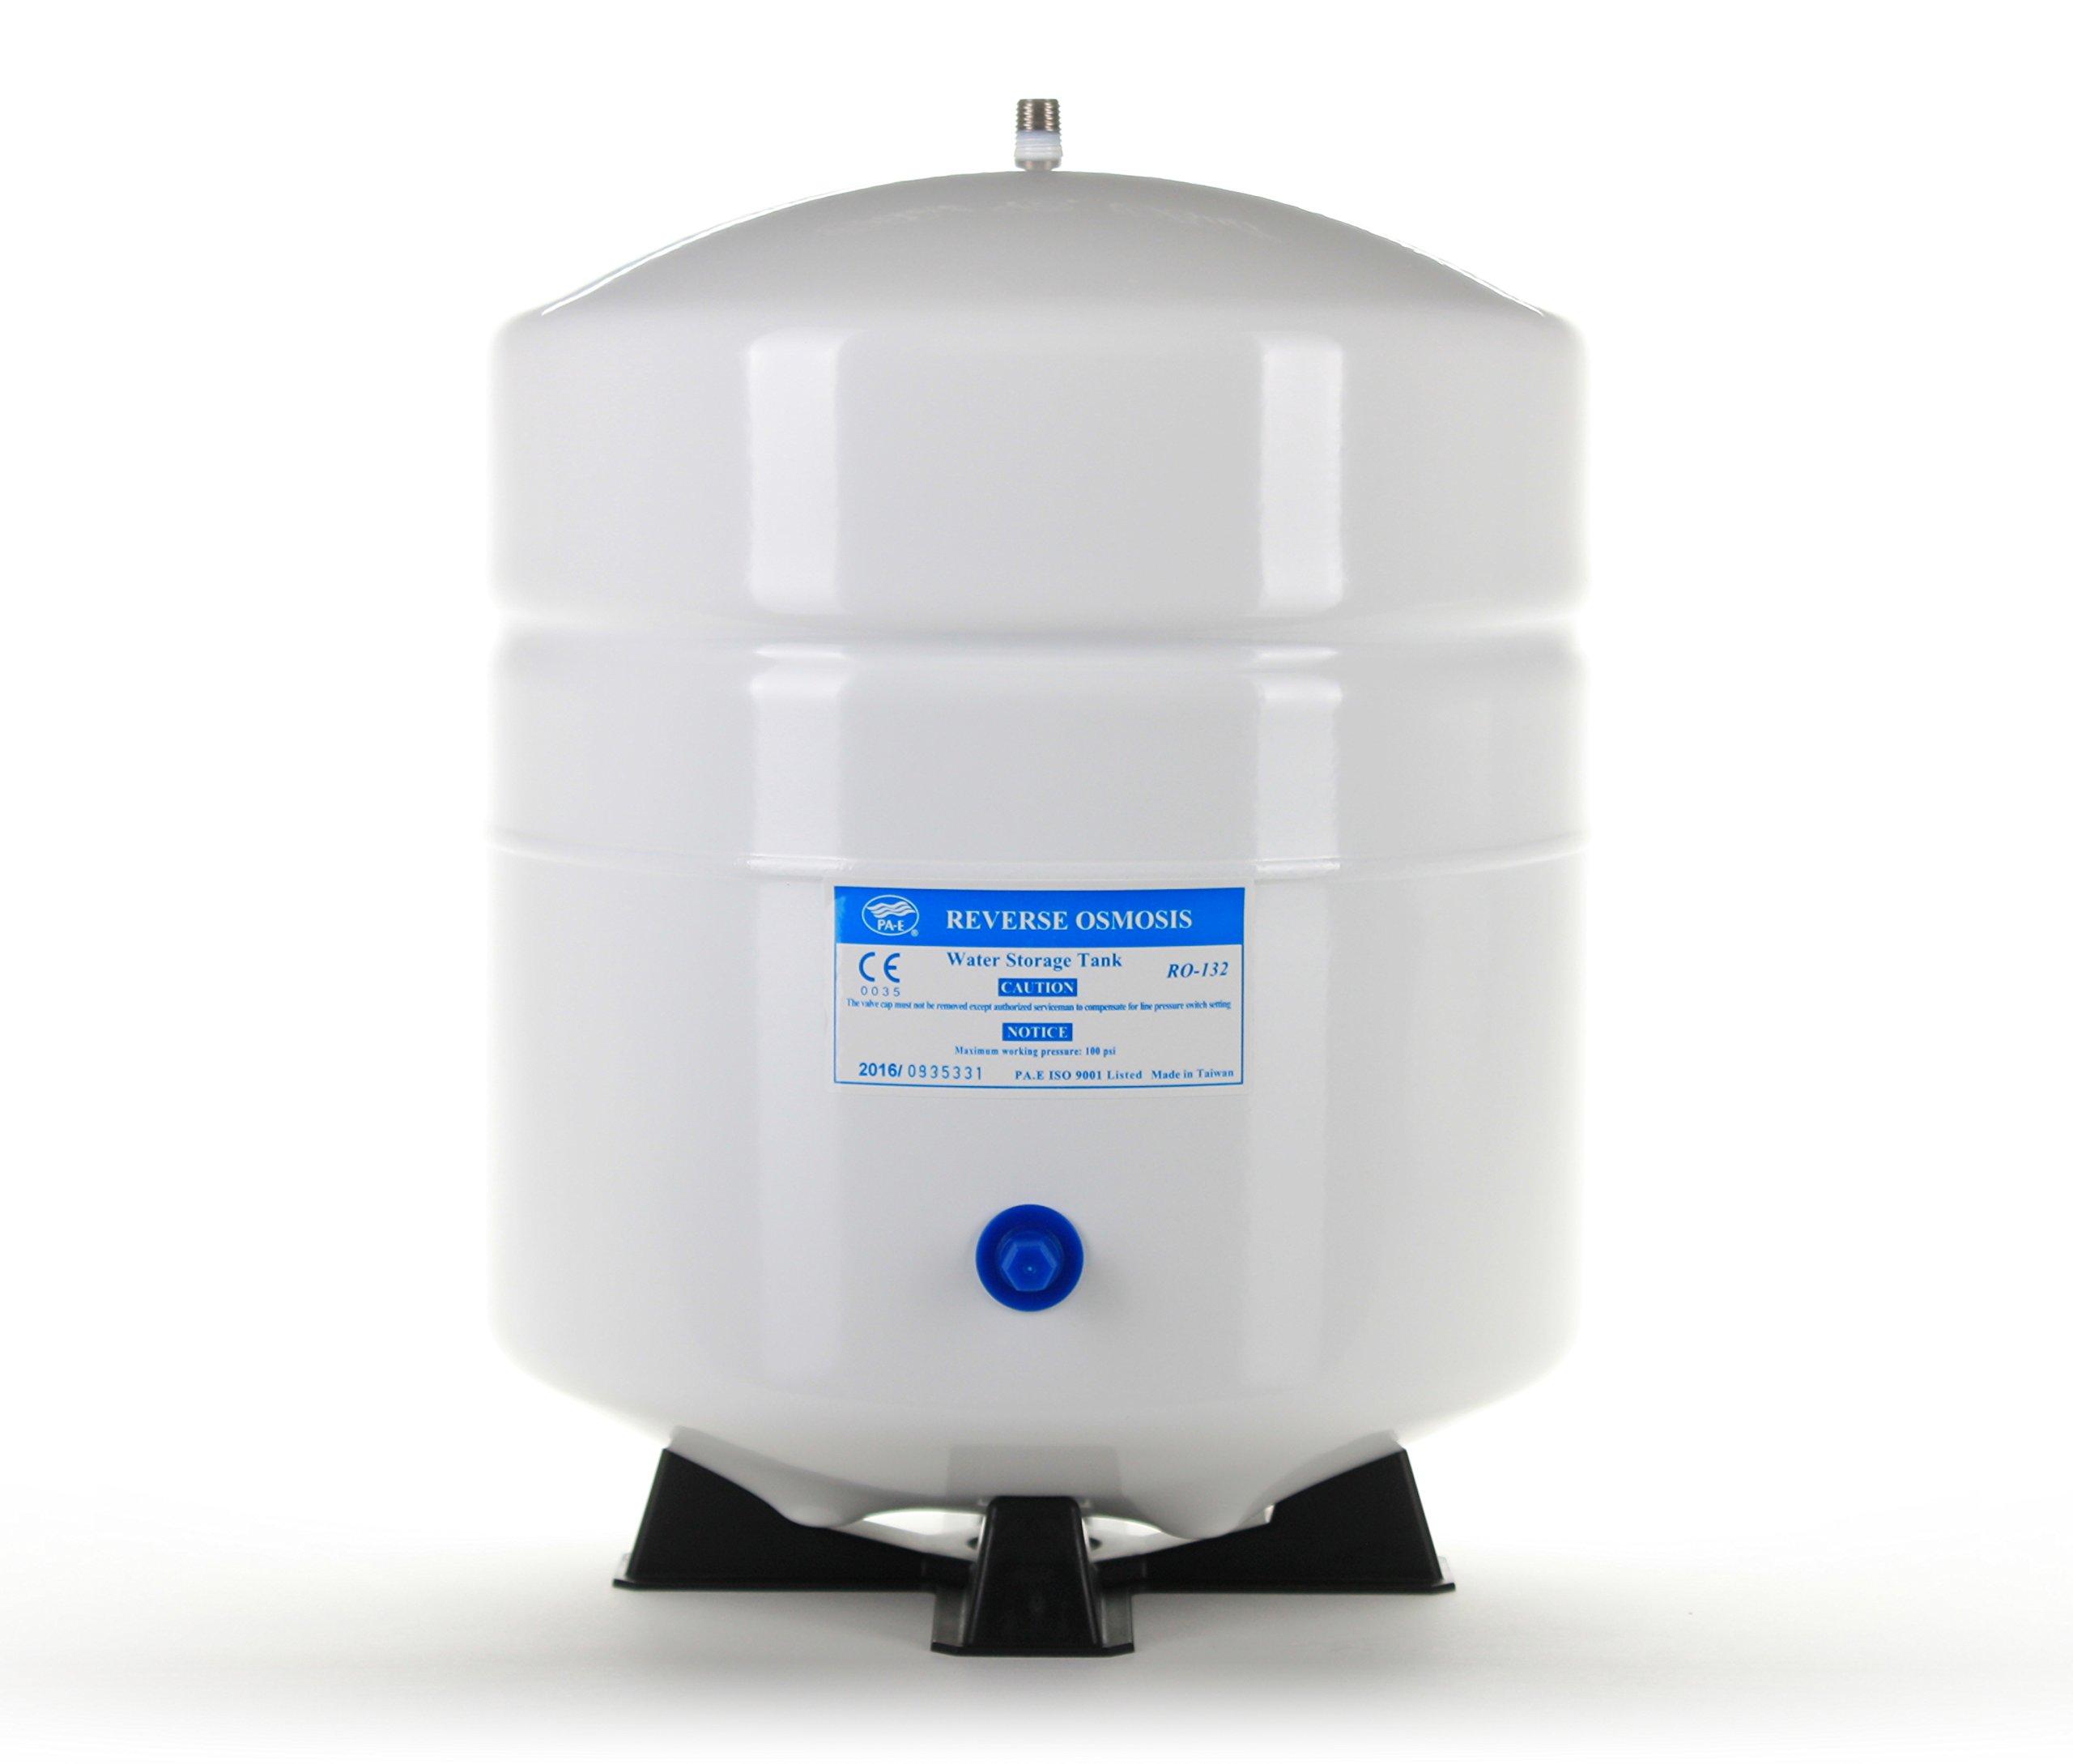 Hydronix RO-132-W14 Stainless Steel 4.5 Gallon Reverse Osmosis Storage Water Tank - White, 1/4'' Port